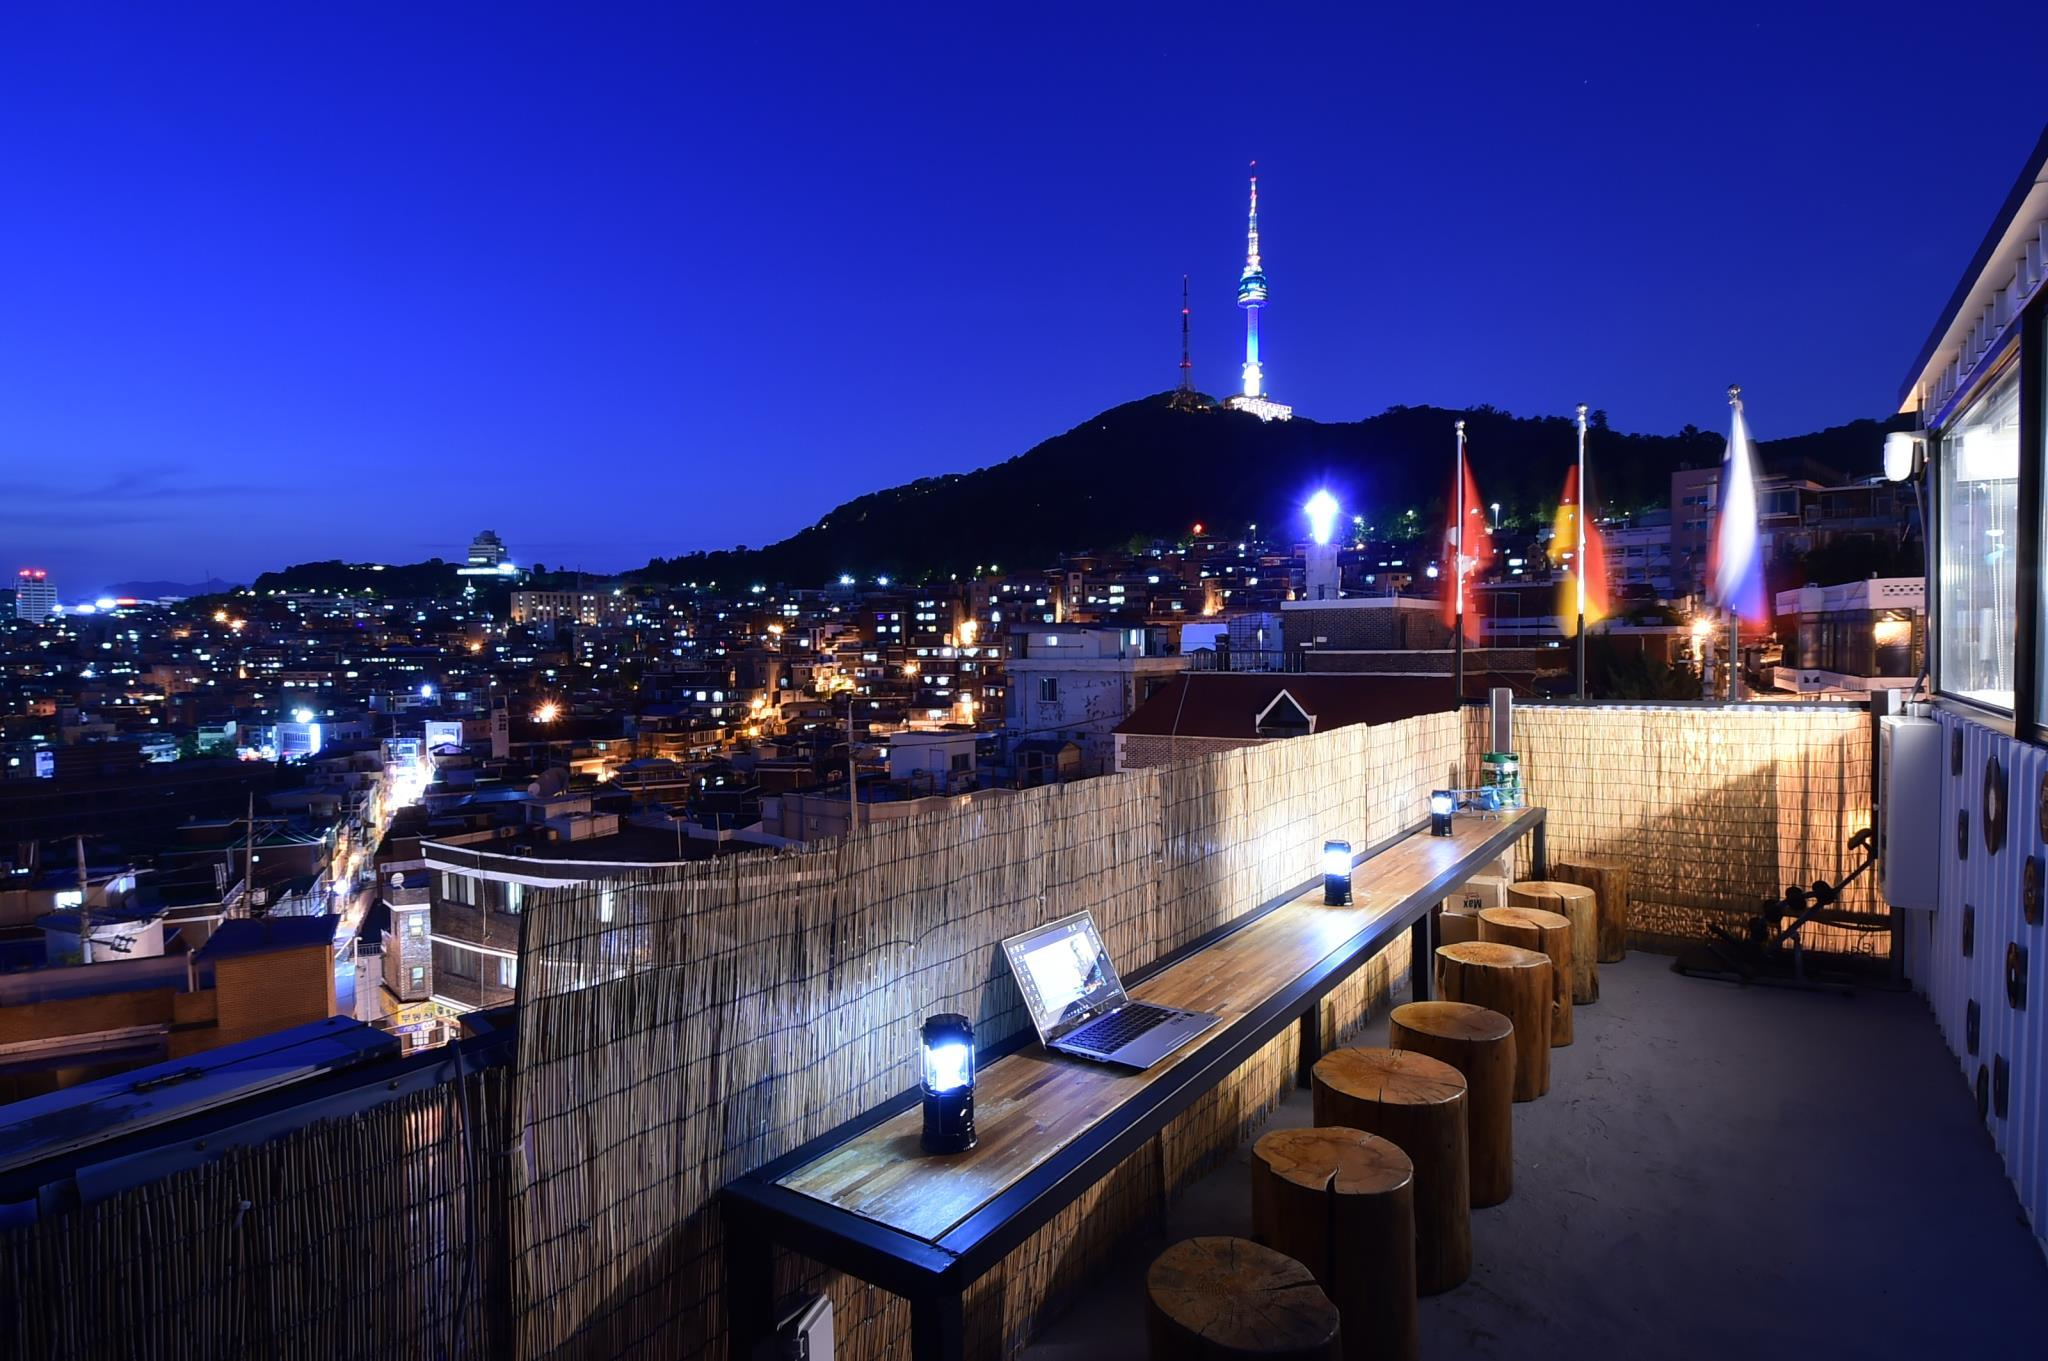 Namsan Photo Park Rooftop Full House